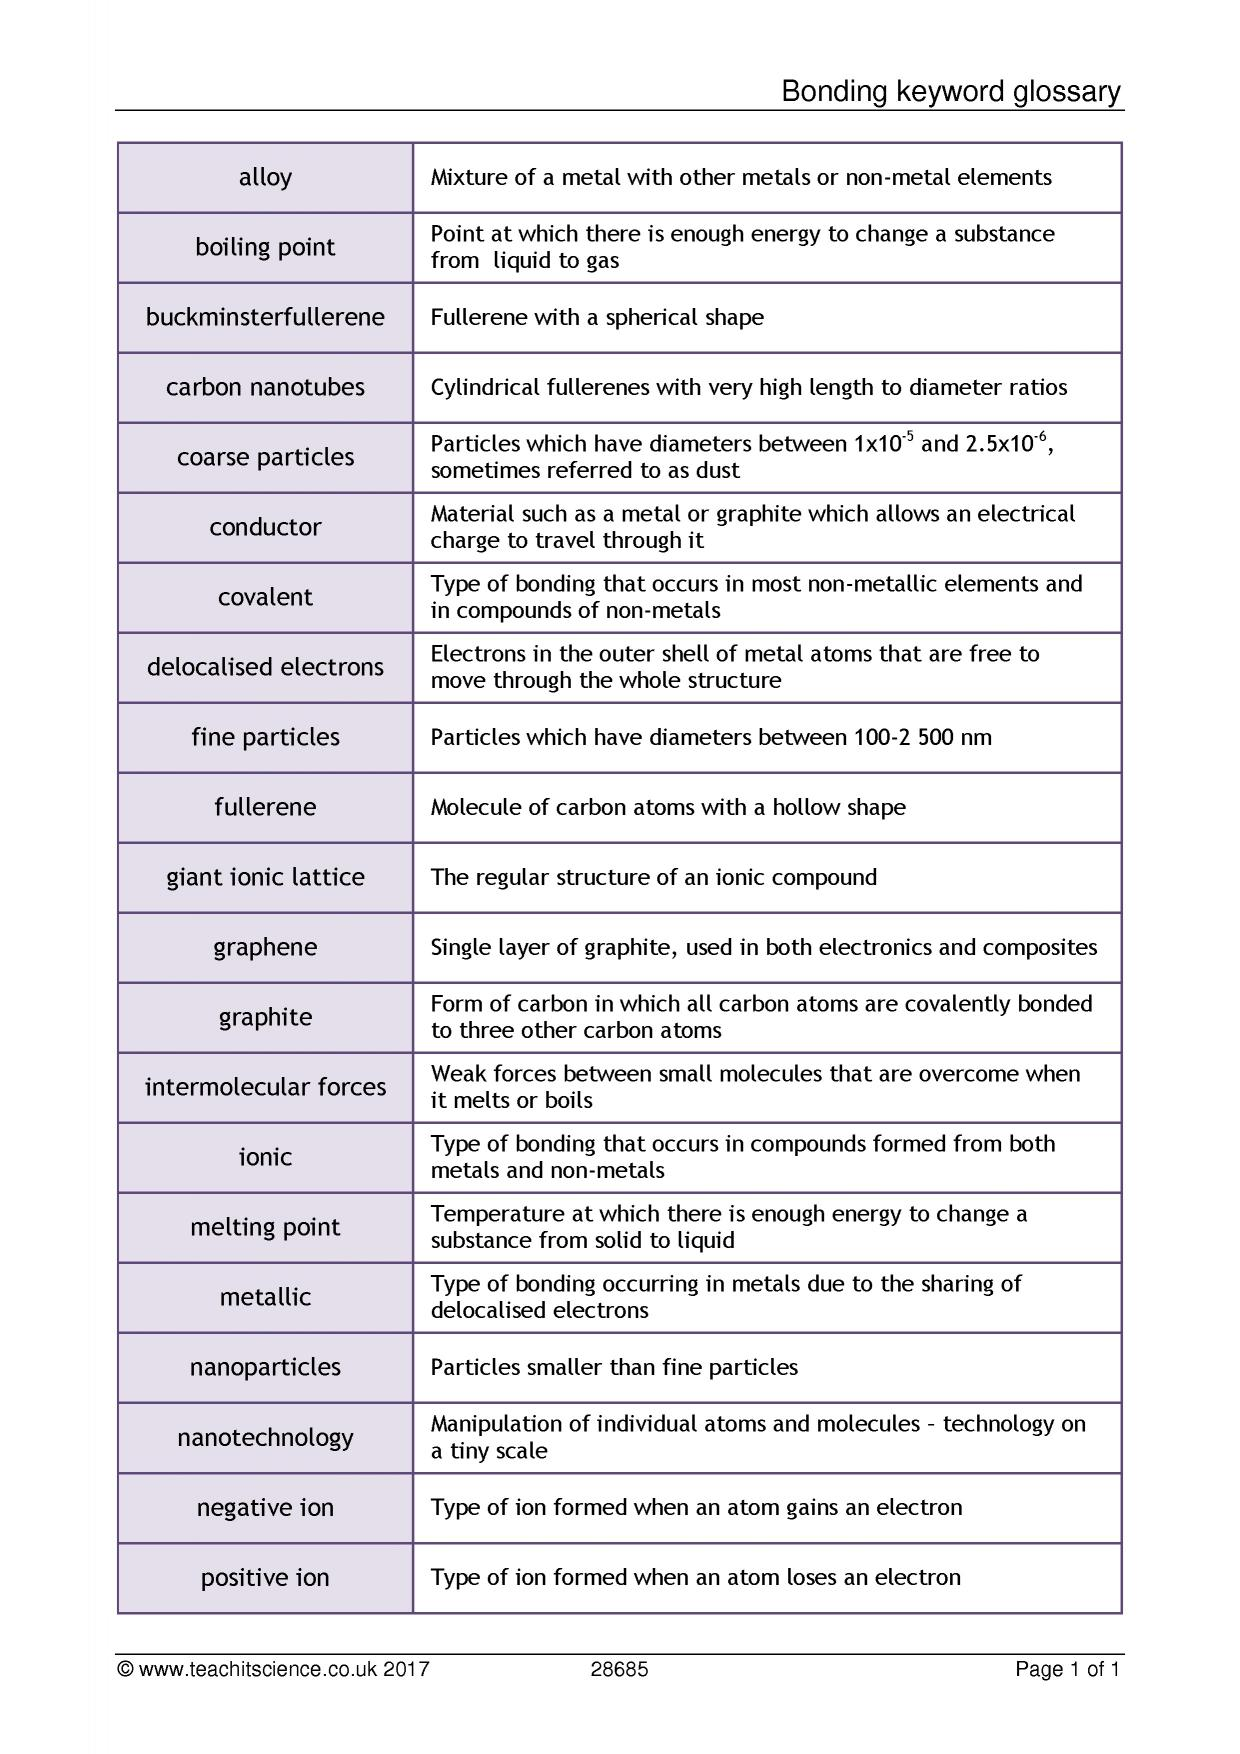 Bonding Keyword Glossary